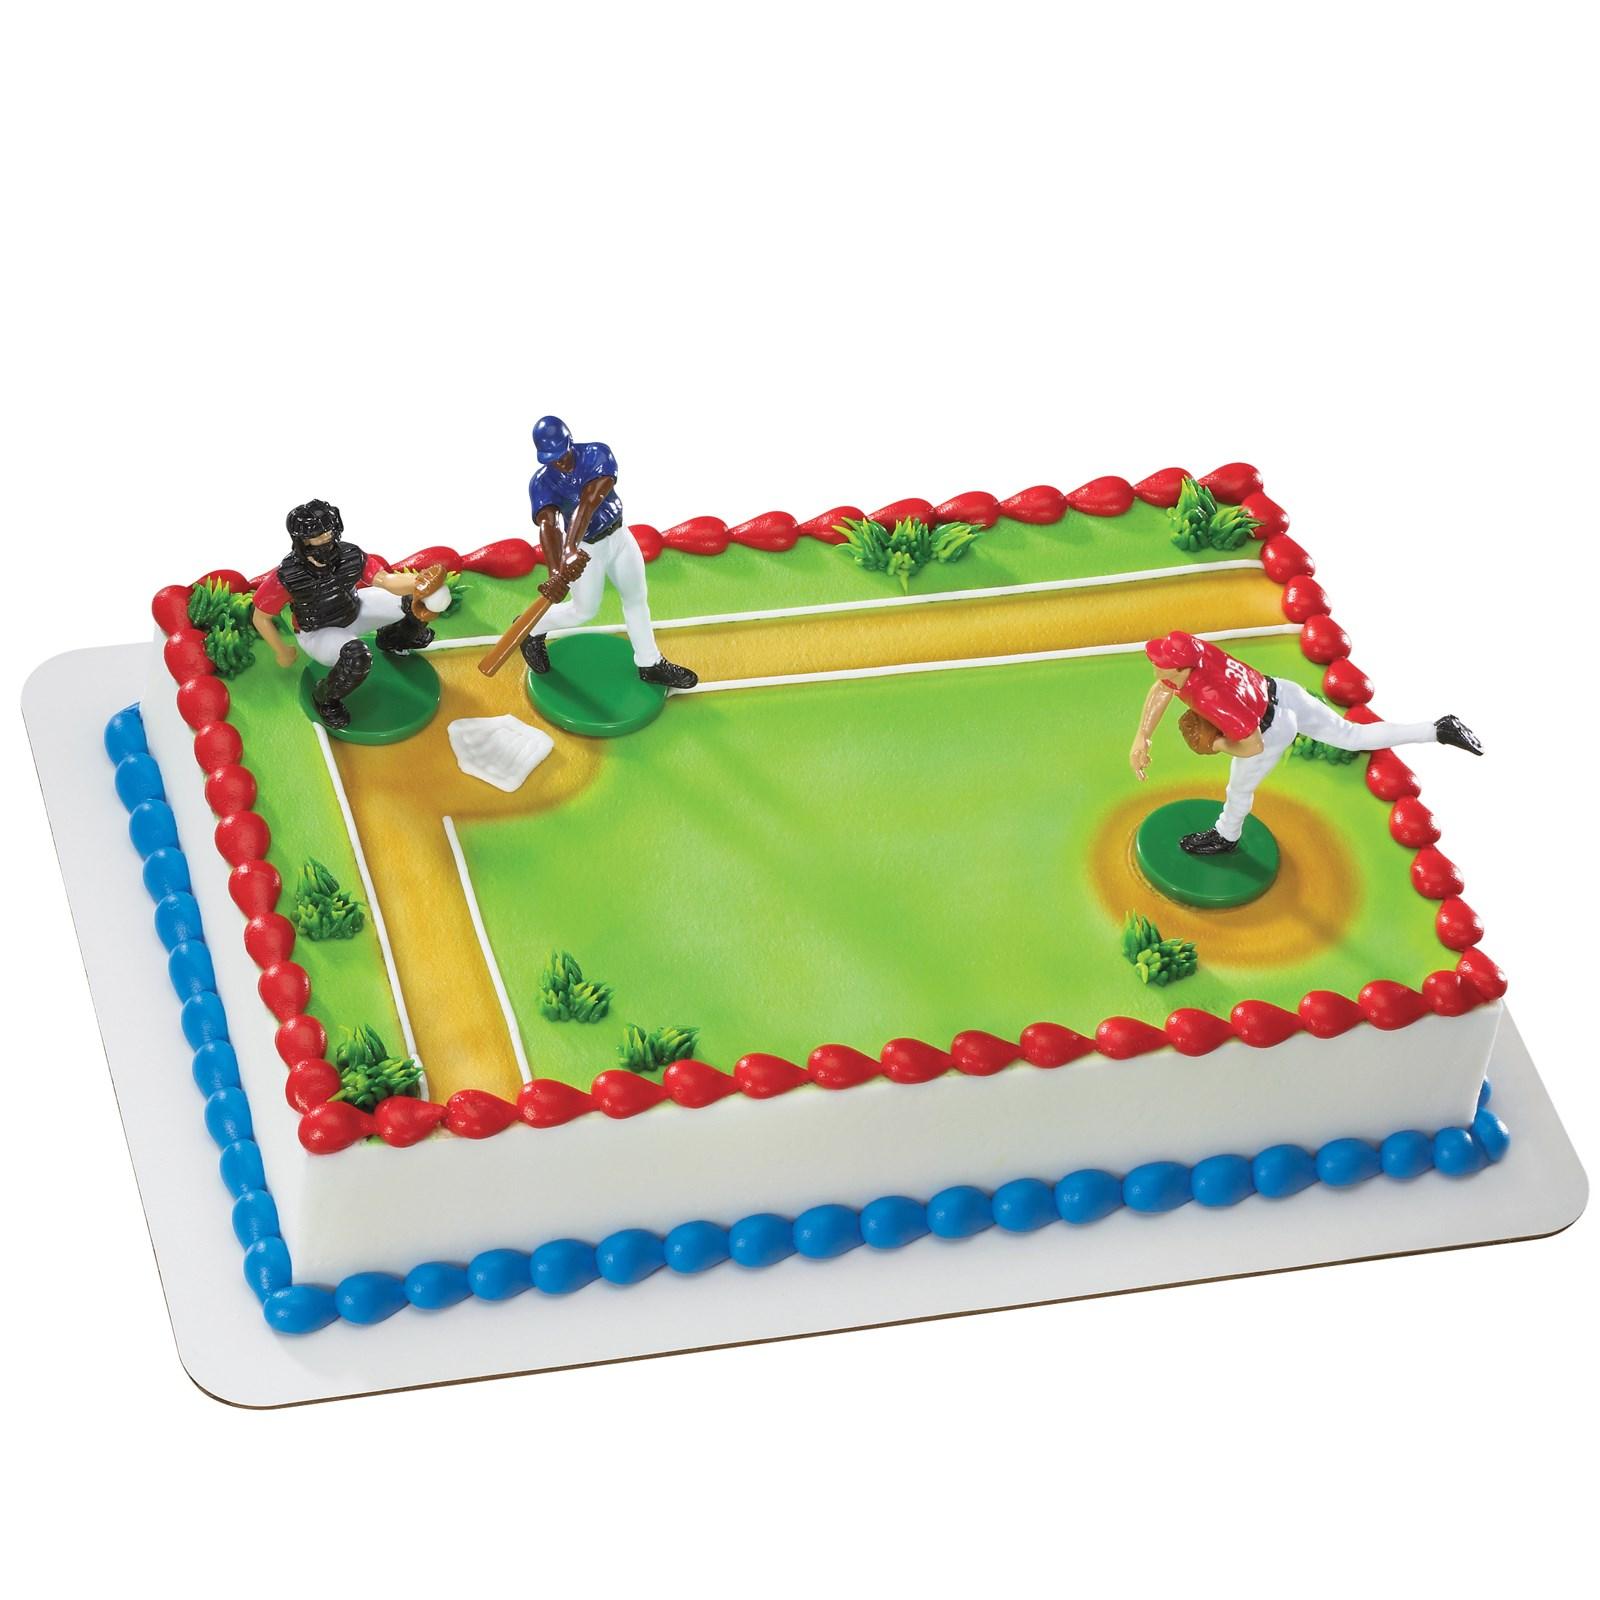 Image of Baseball Player Cake Decorations